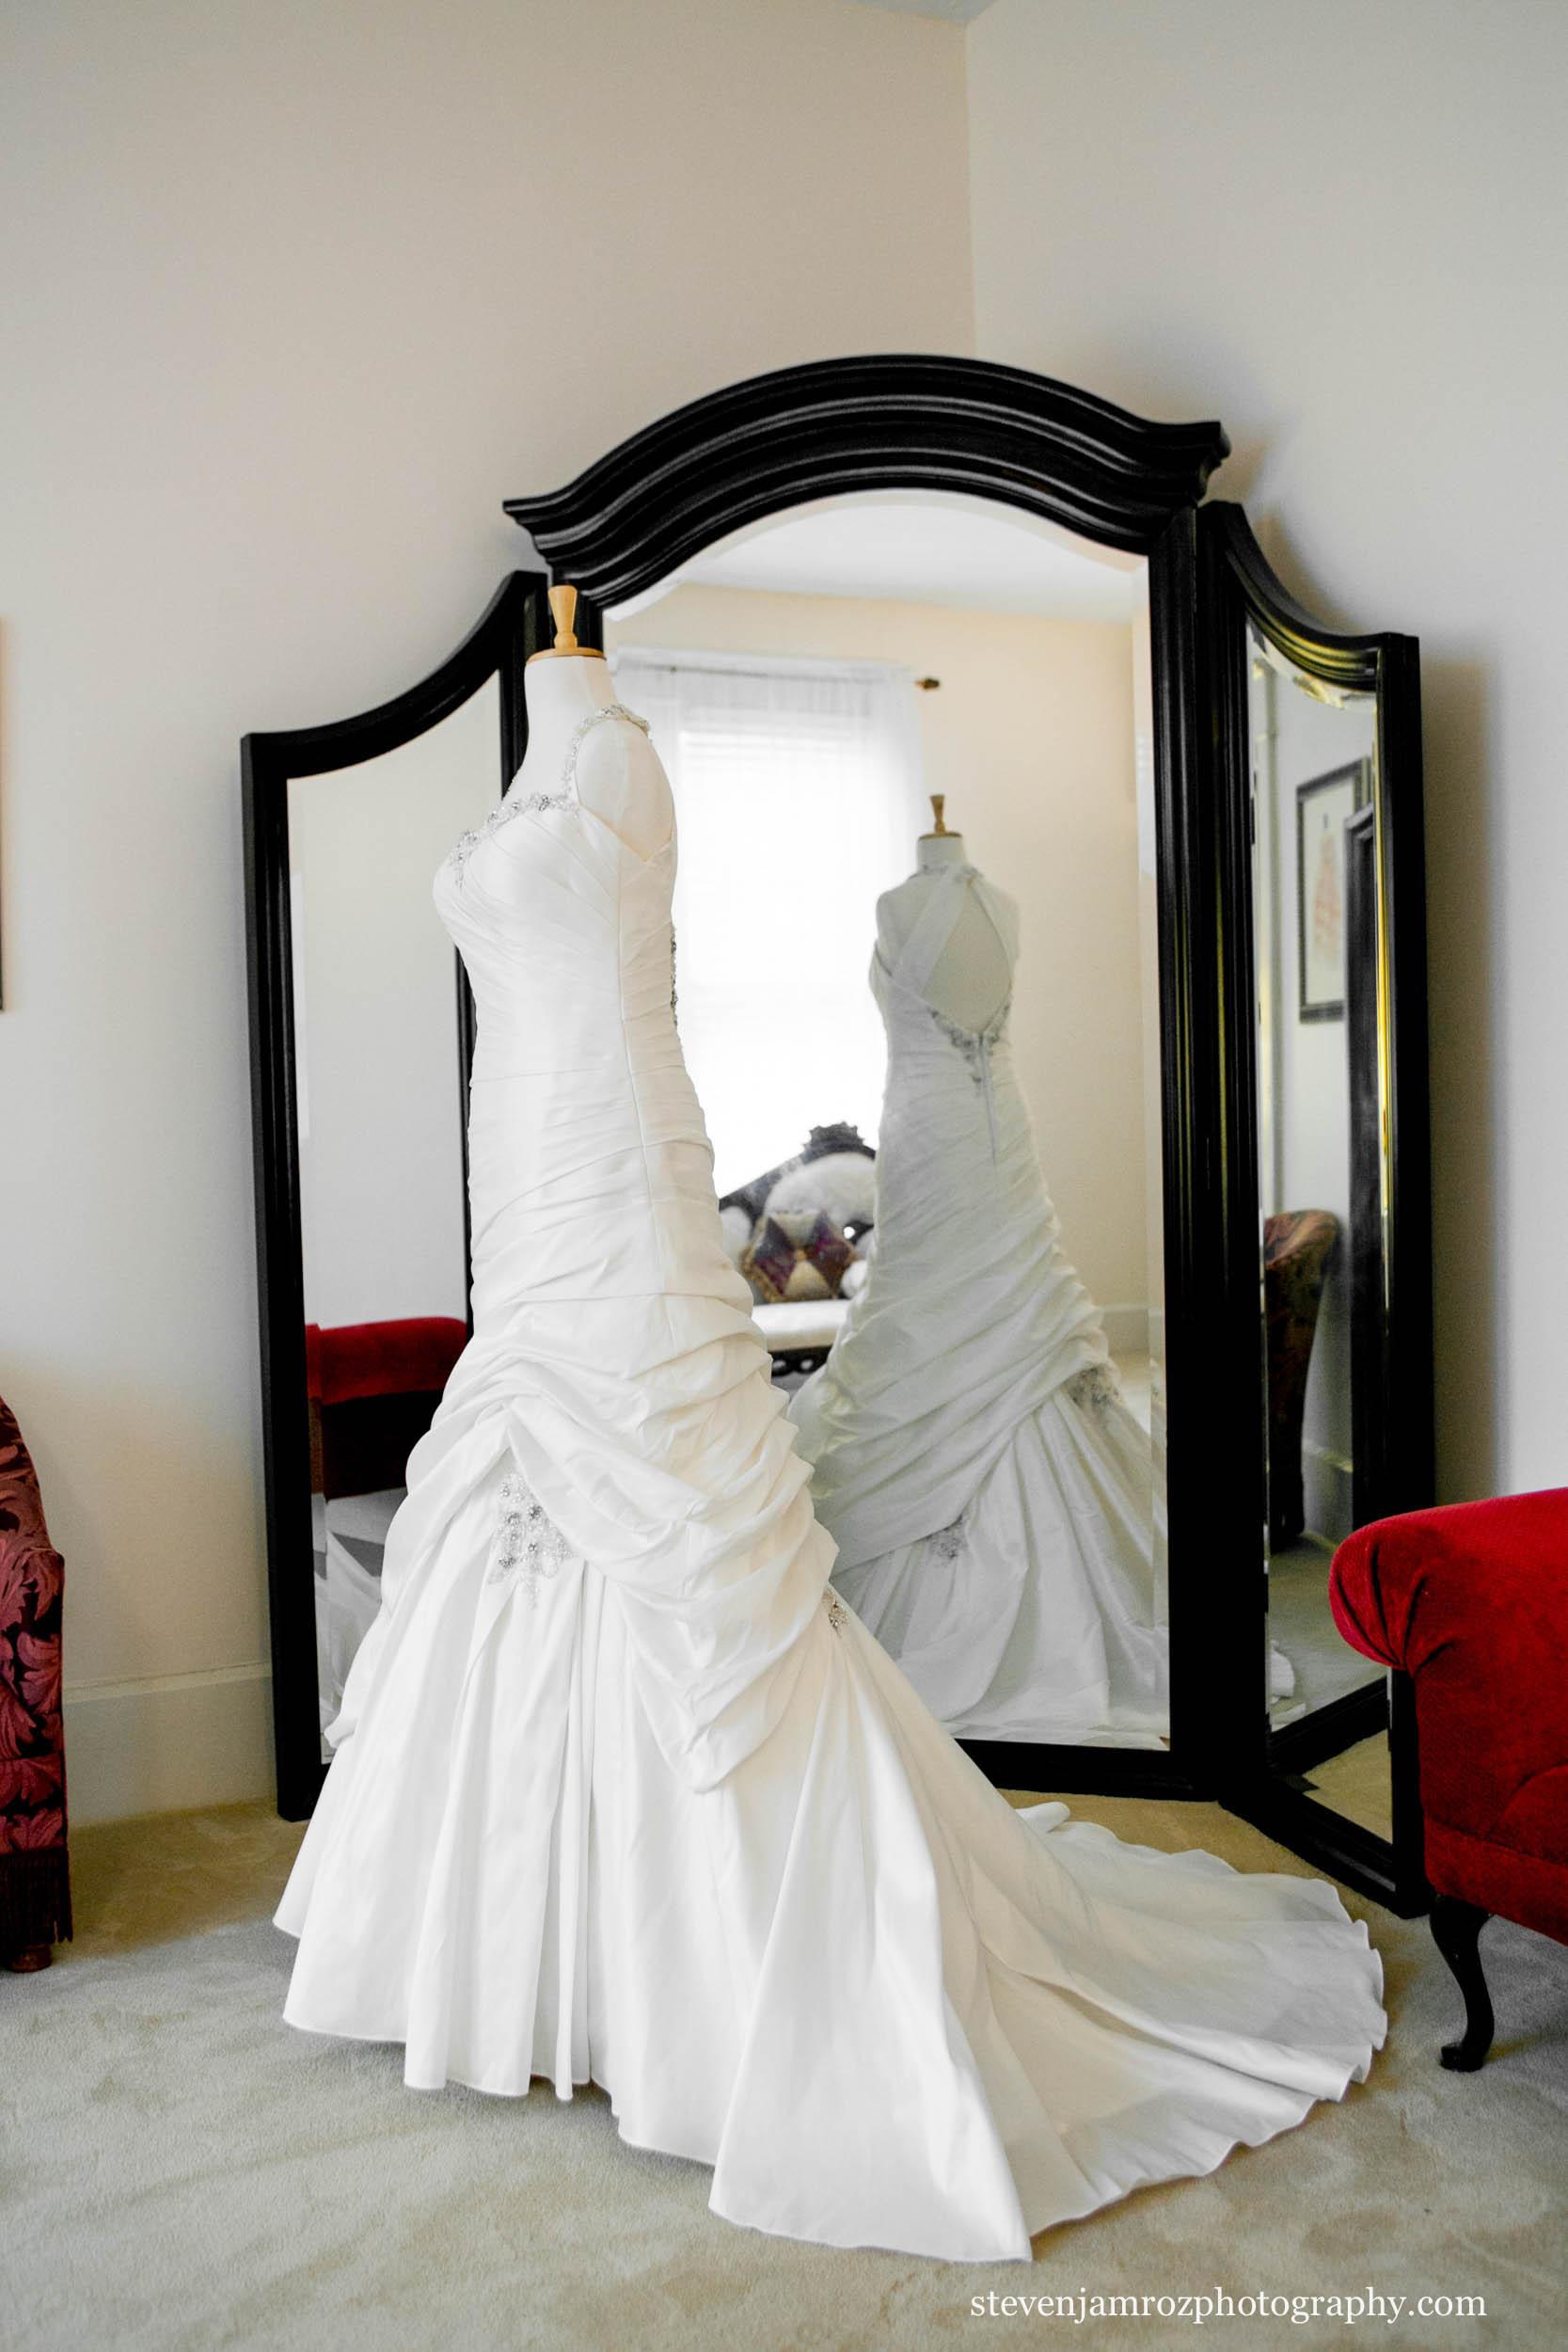 hudson-manor-bridal-room-wedding photographer-steven-jamroz-0644.jpg